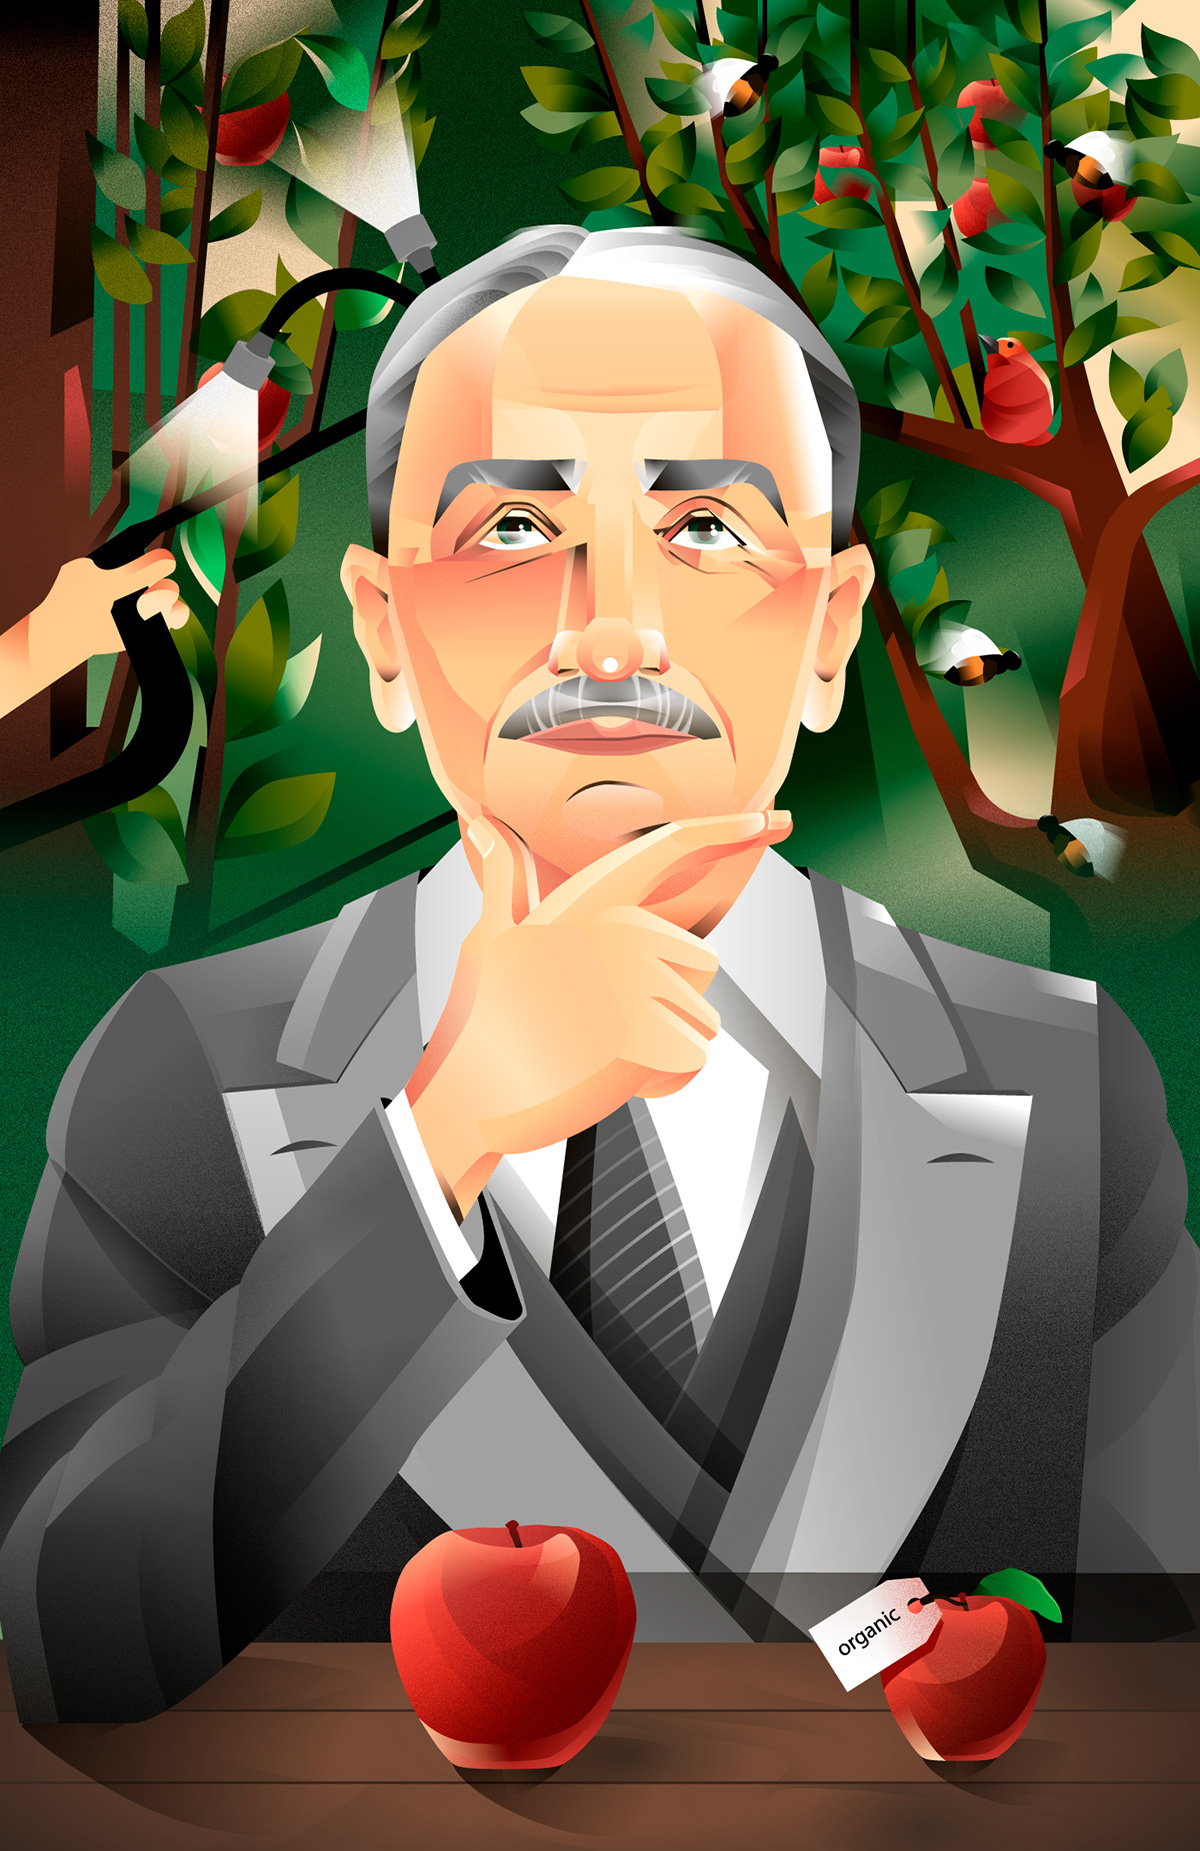 ayn rand ecomomy economist friedrich hayek Ludwig Von Mises Murray Rothbard philosophy  poster vector vintage